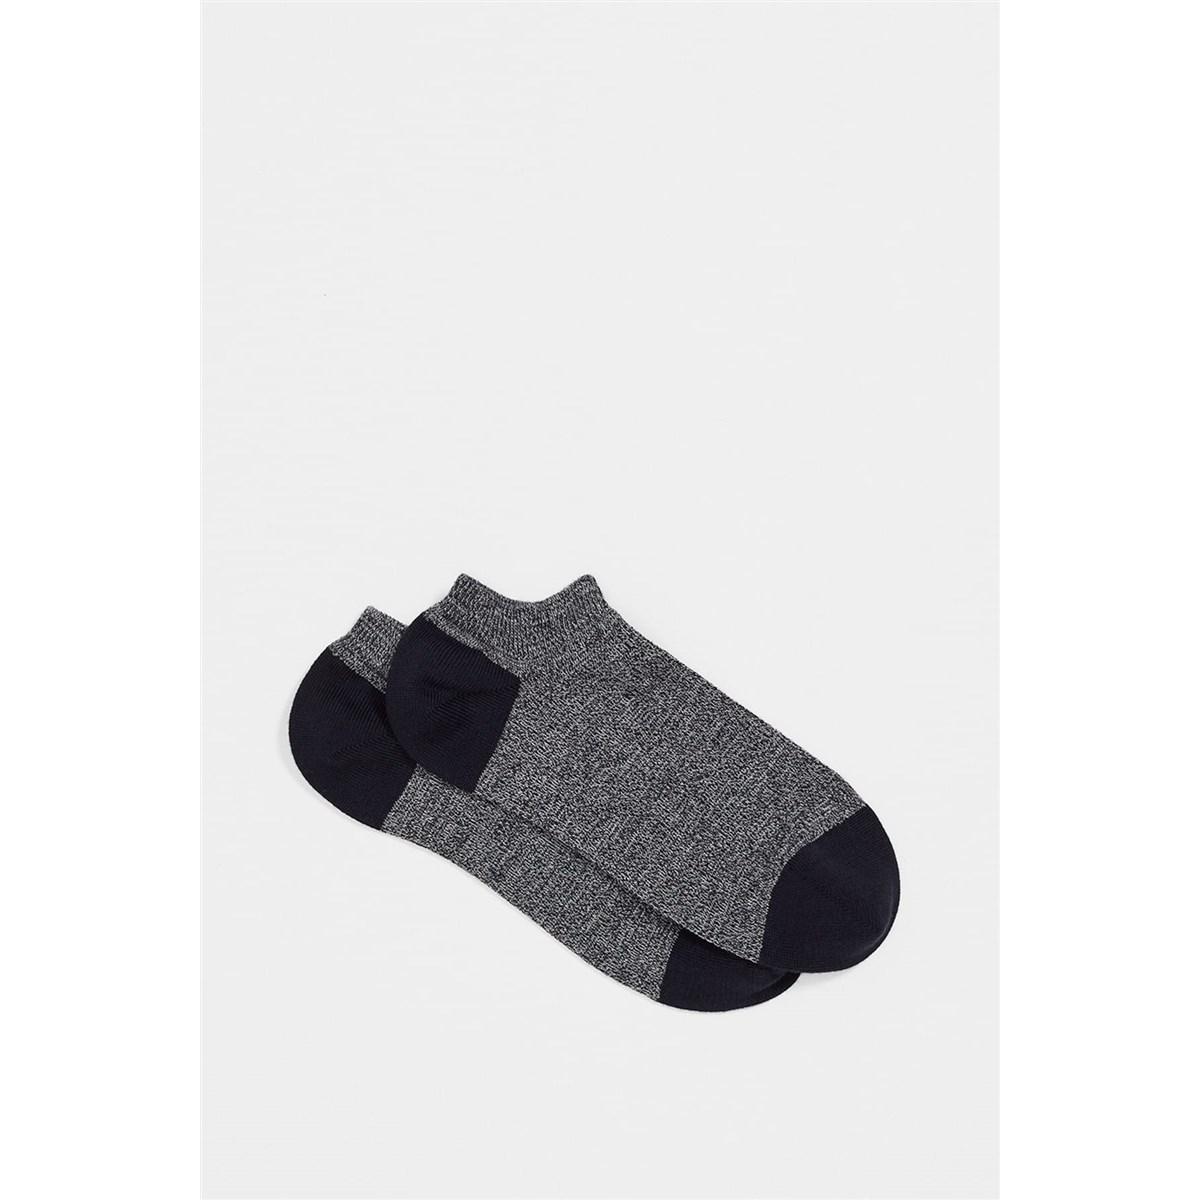 Mavi Jeans Lacivert Erkek Patik Çorap